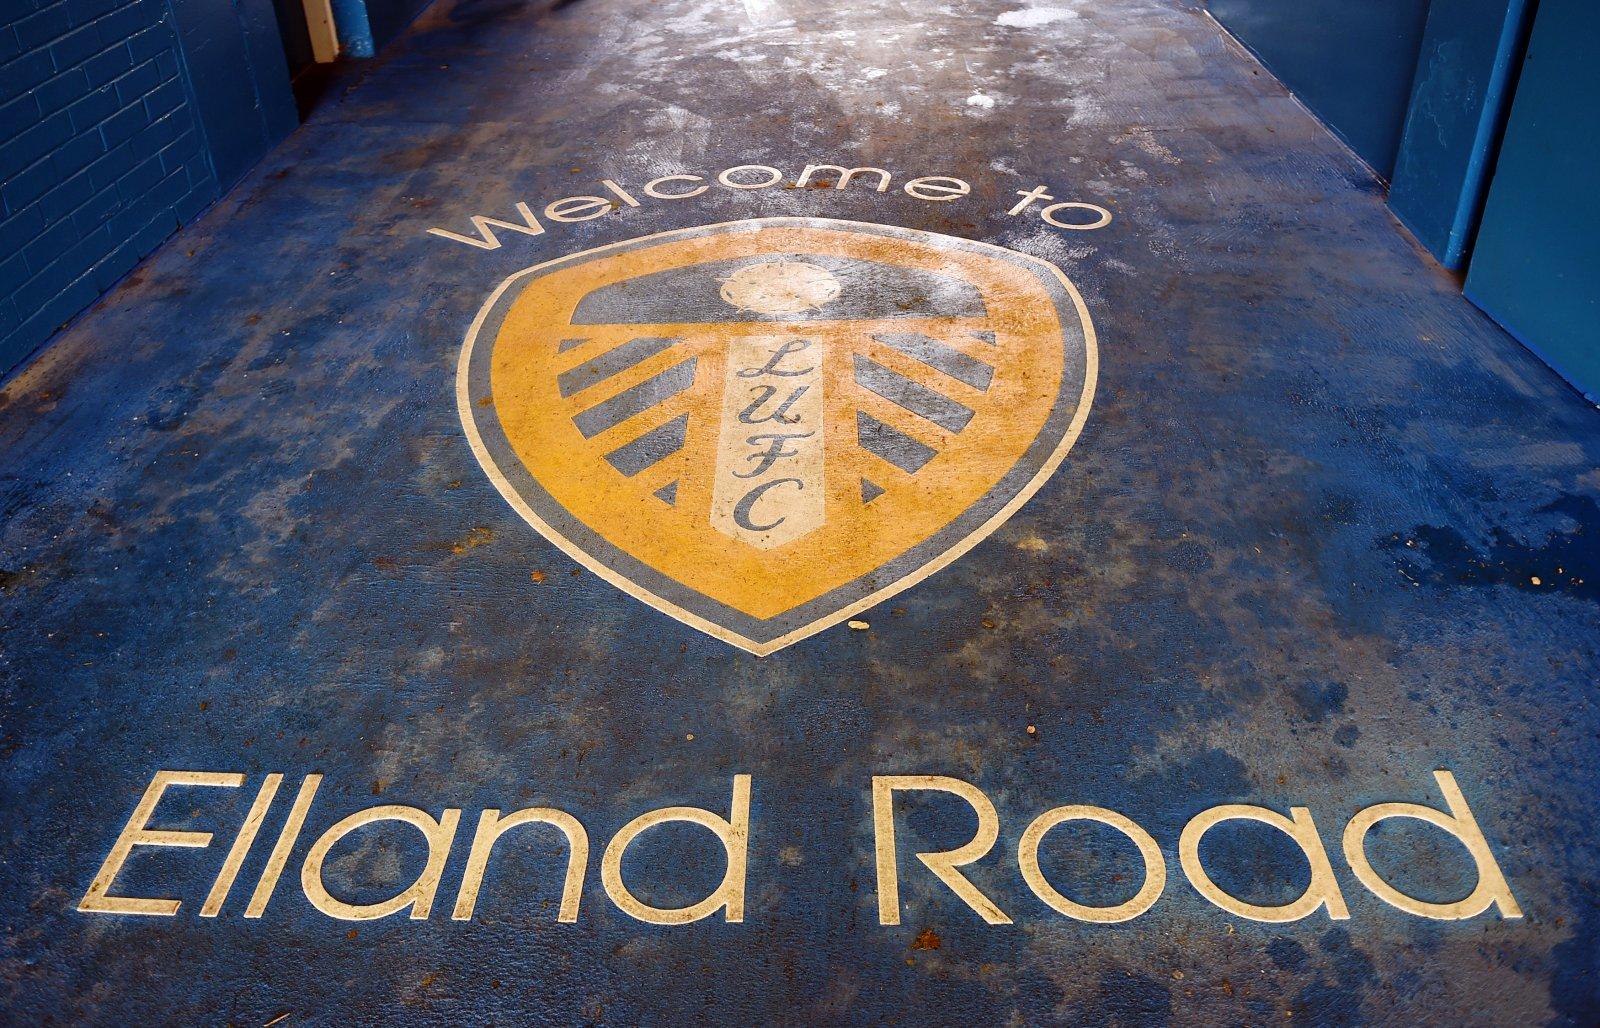 Leeds United Badge How To Avoid Falling Foul Of Fan Engagement Digital Sport